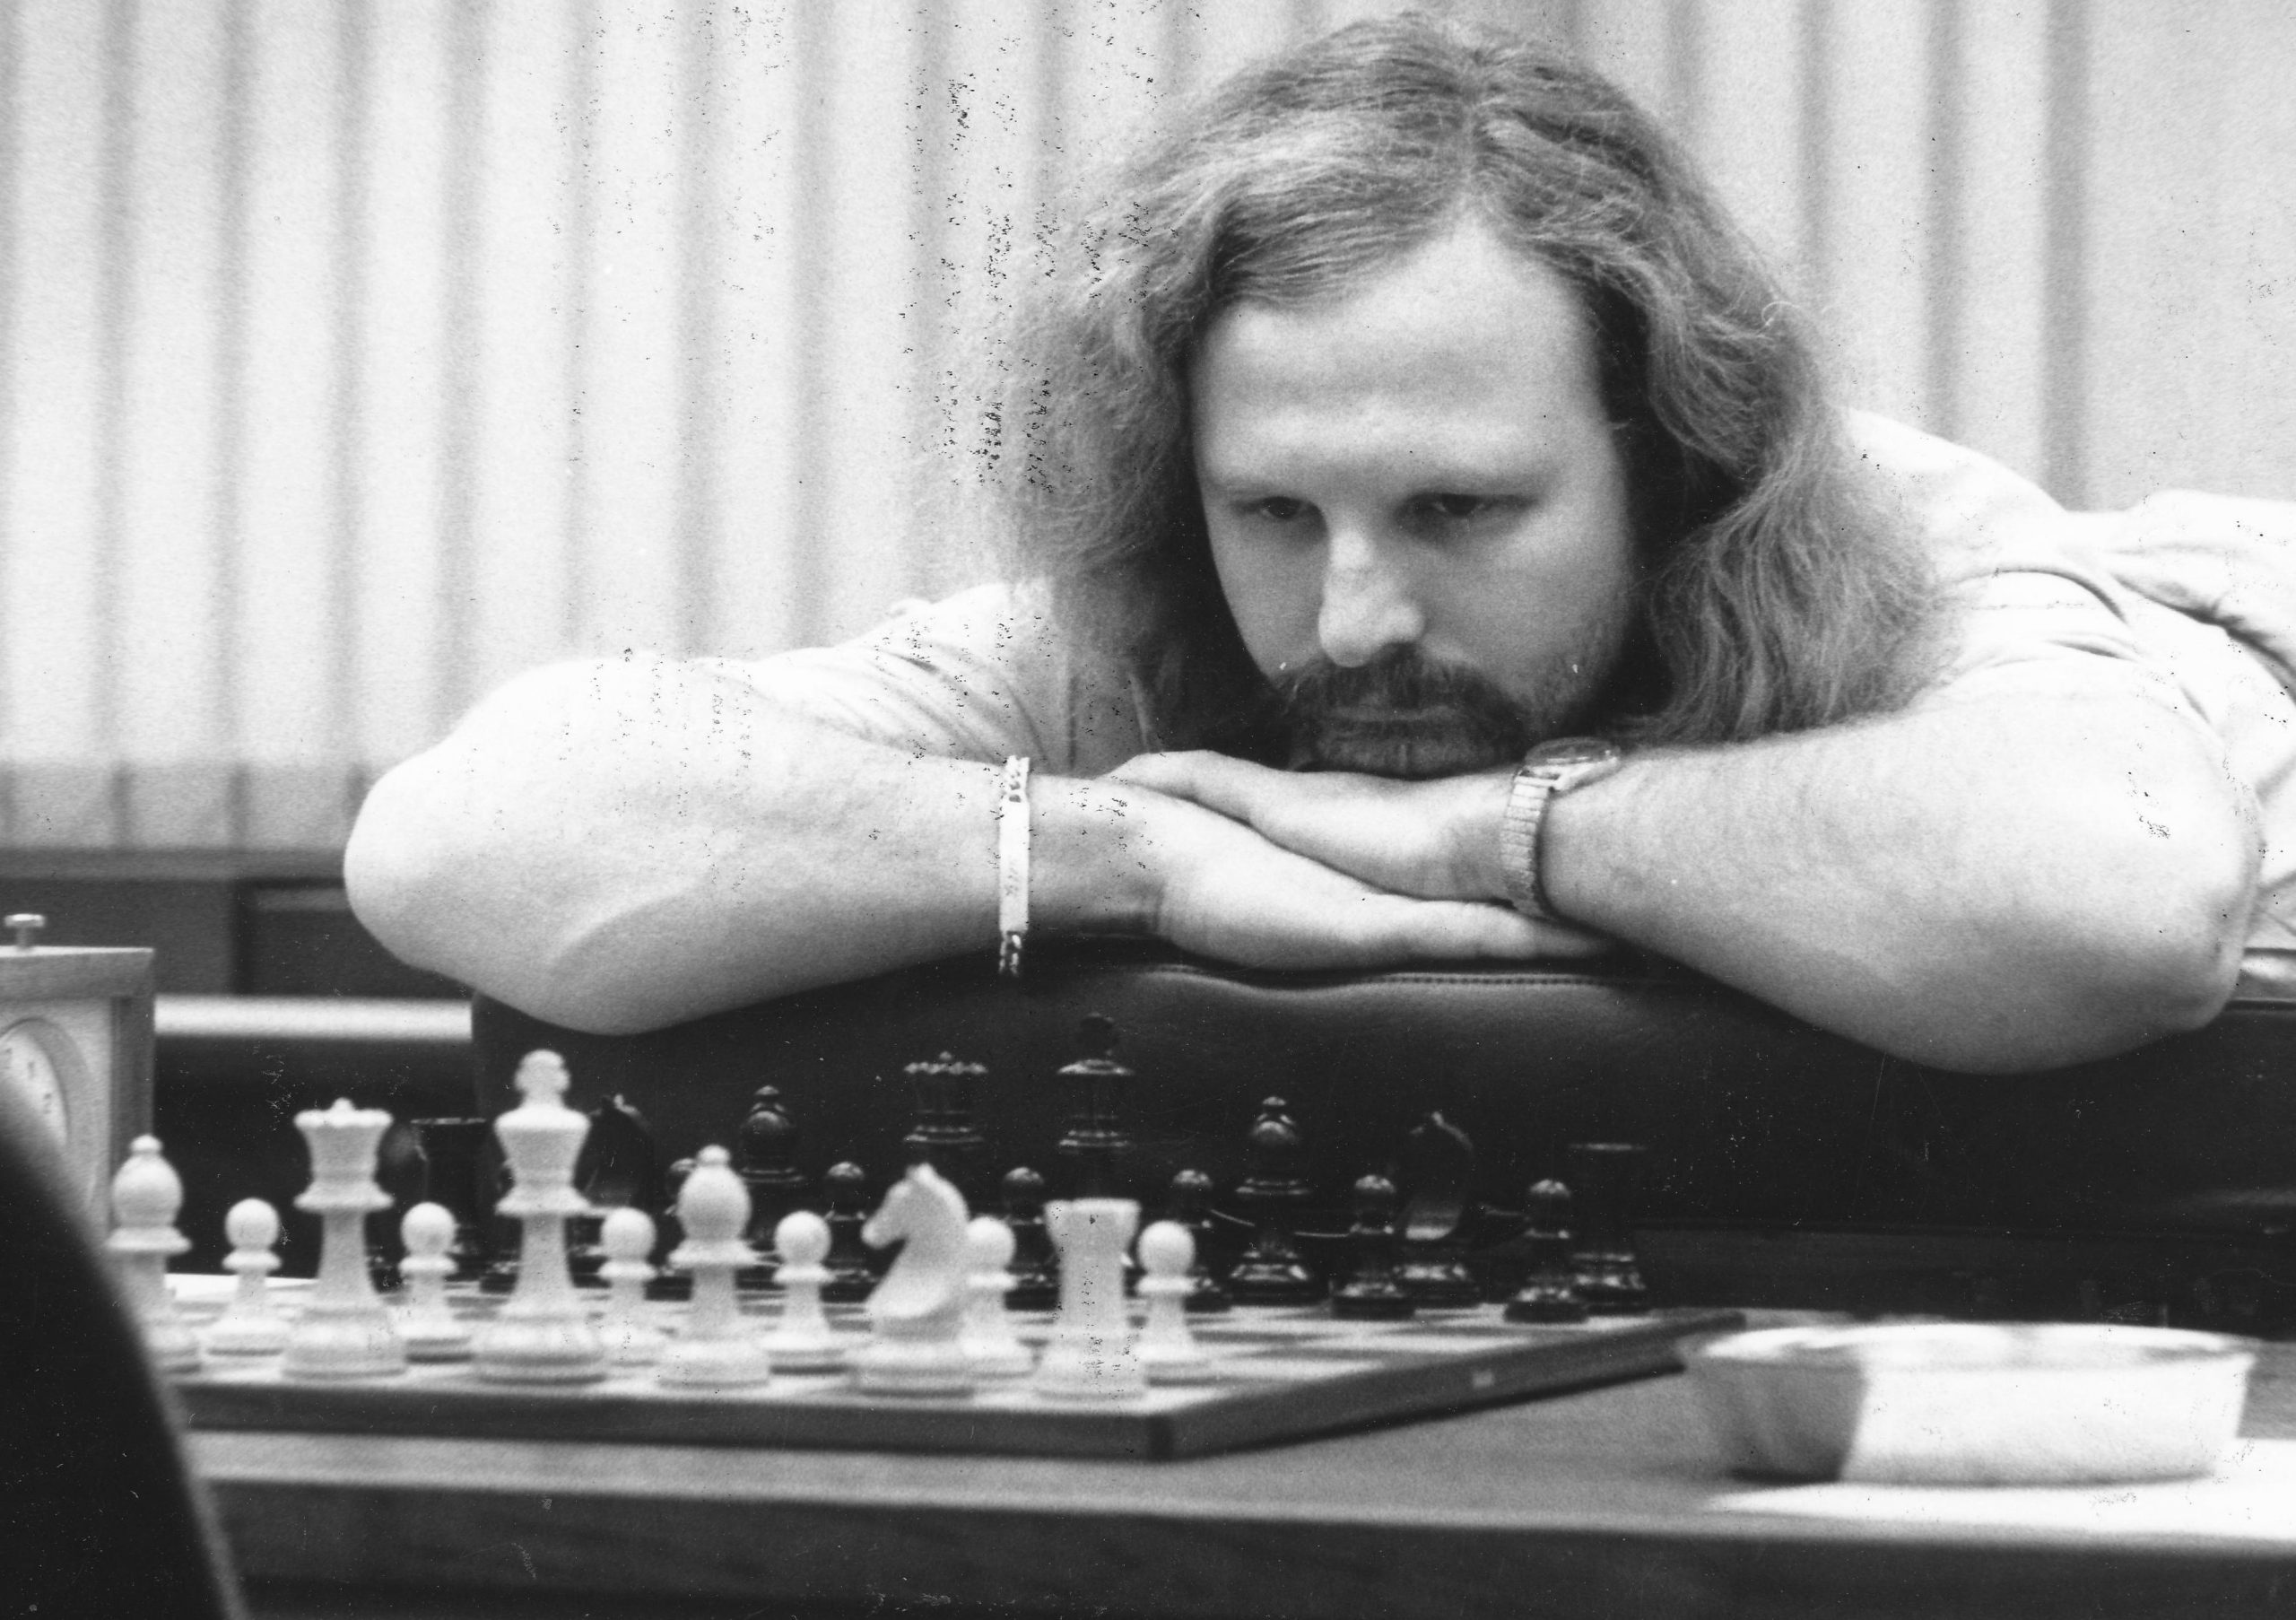 Tony Miles at Tilburg 1985